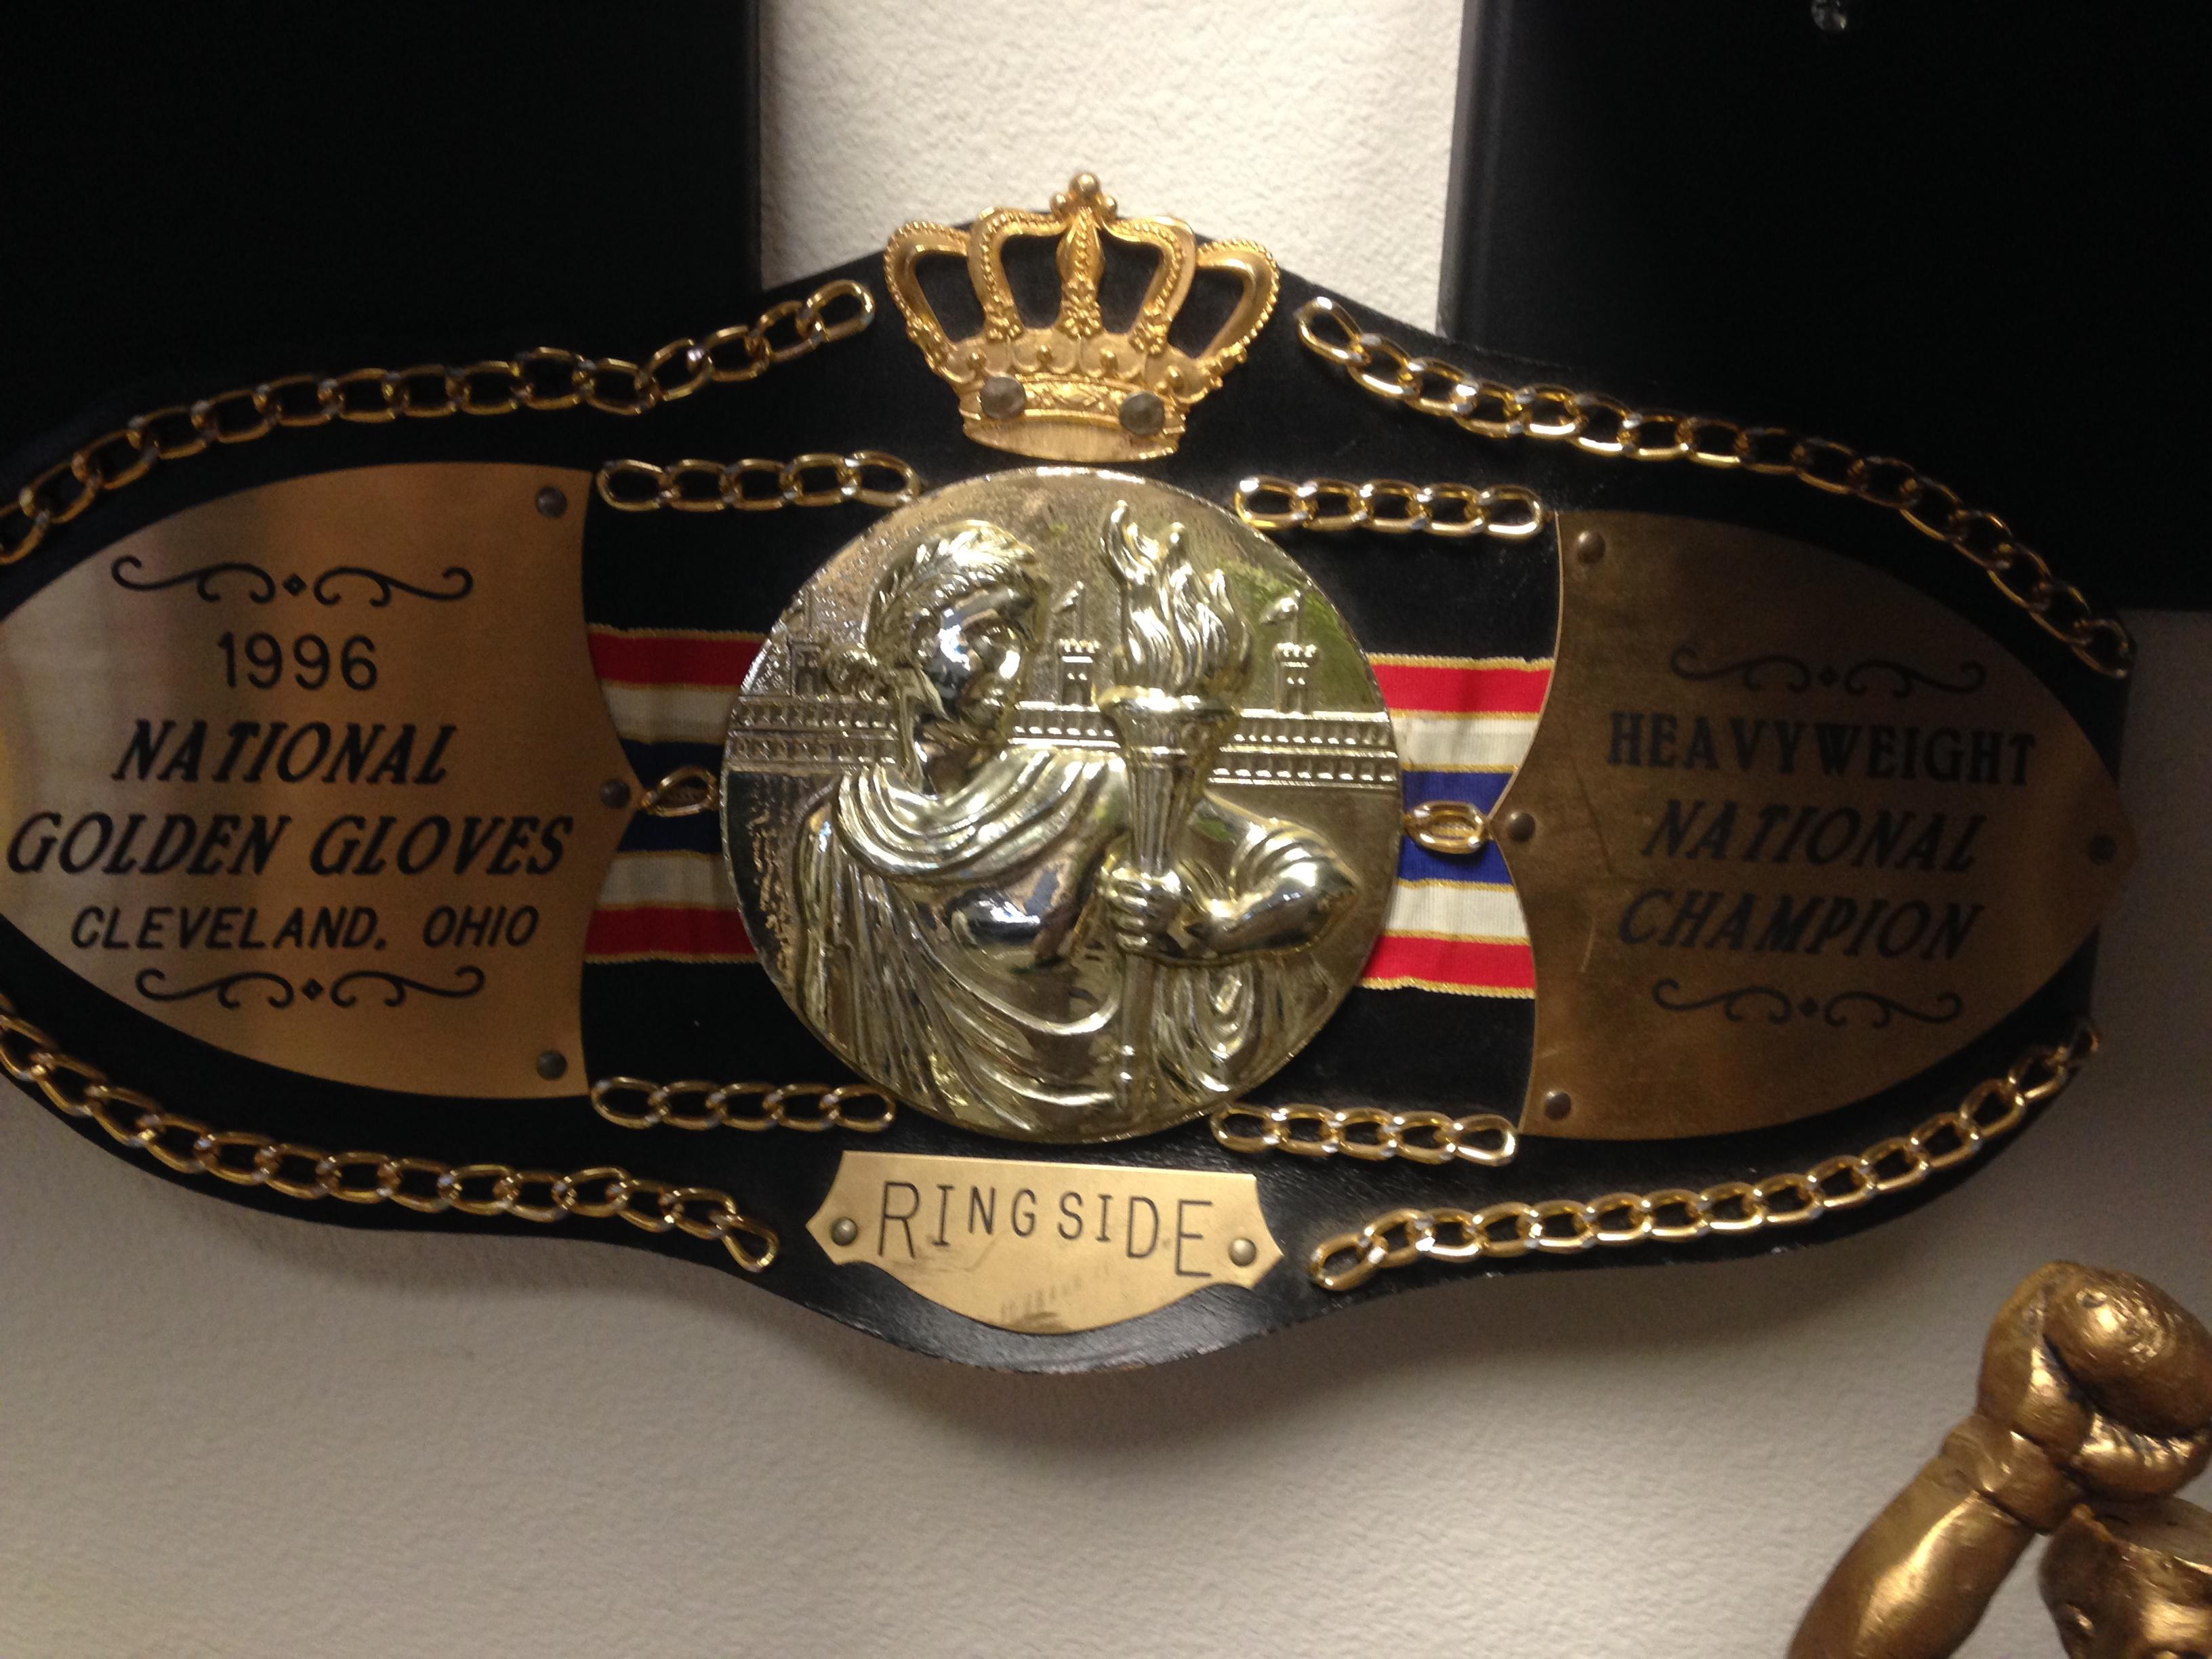 Golden Gloves Heavyweight Champion